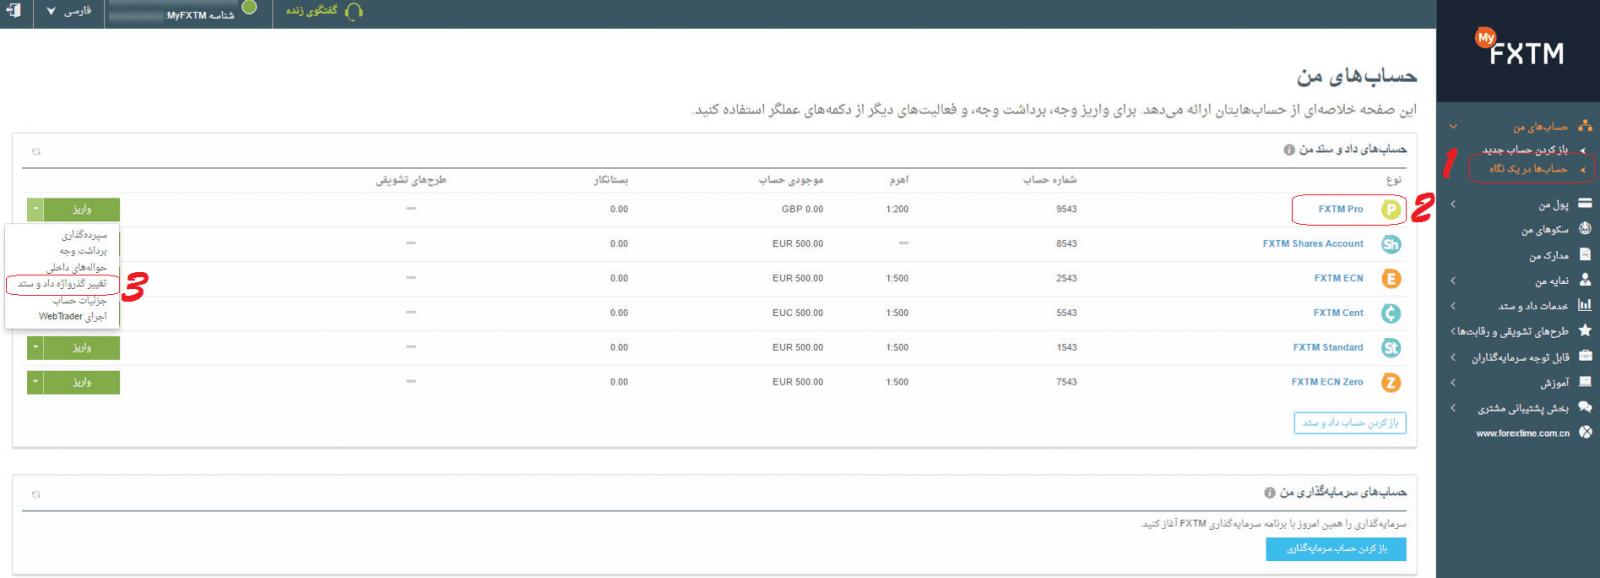 تغییر رمز عبور حساب معاملاتی FXTM